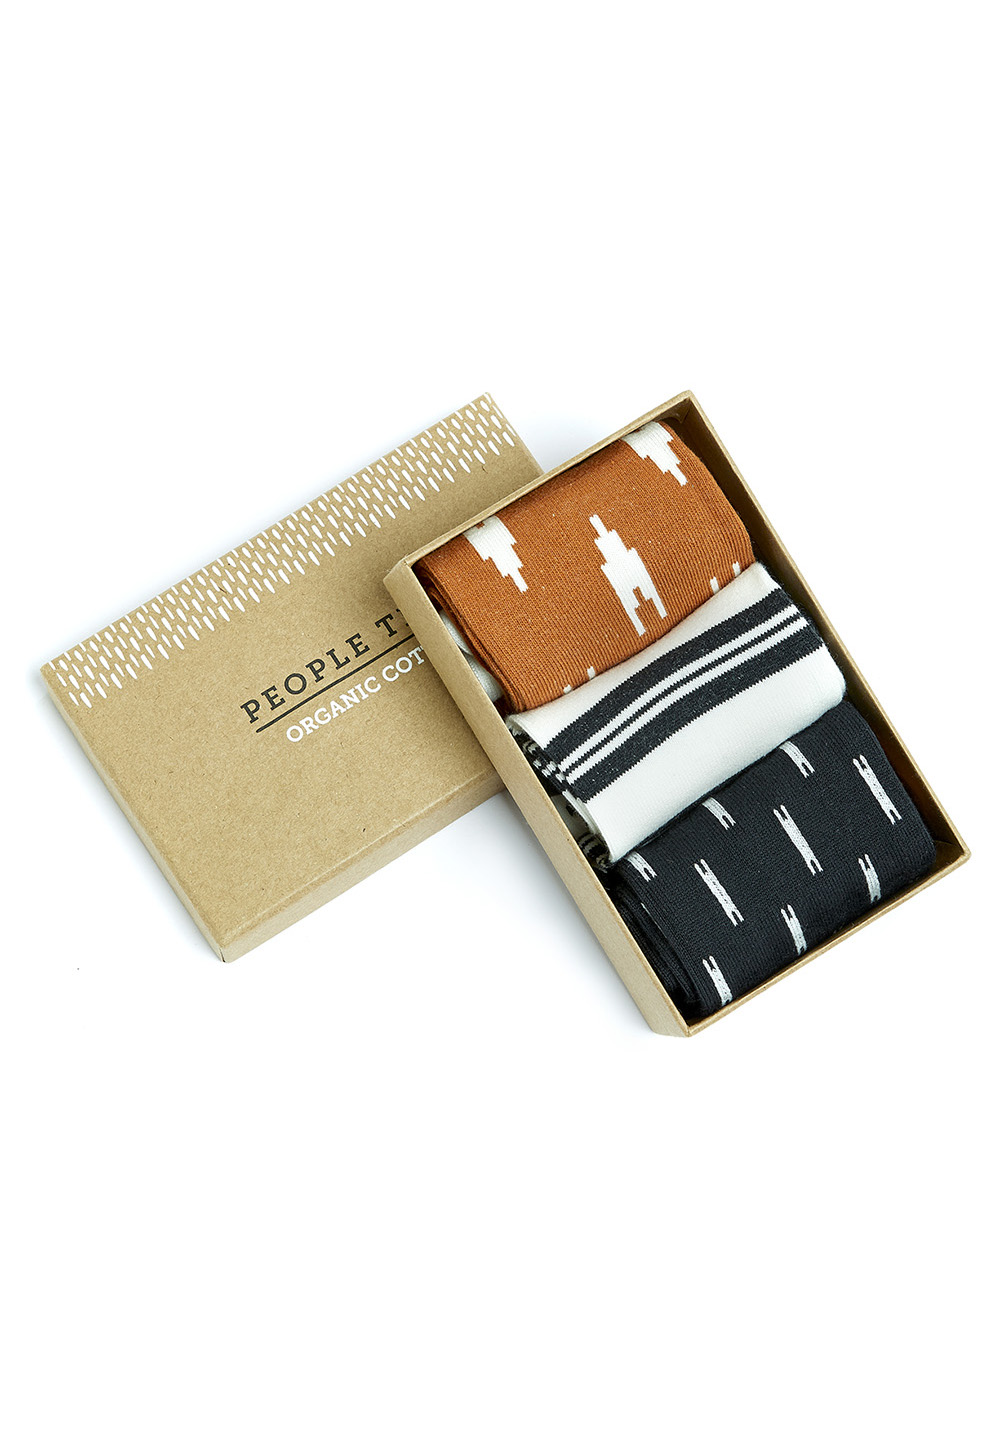 Summer Socks Set of 3 in box 35-38